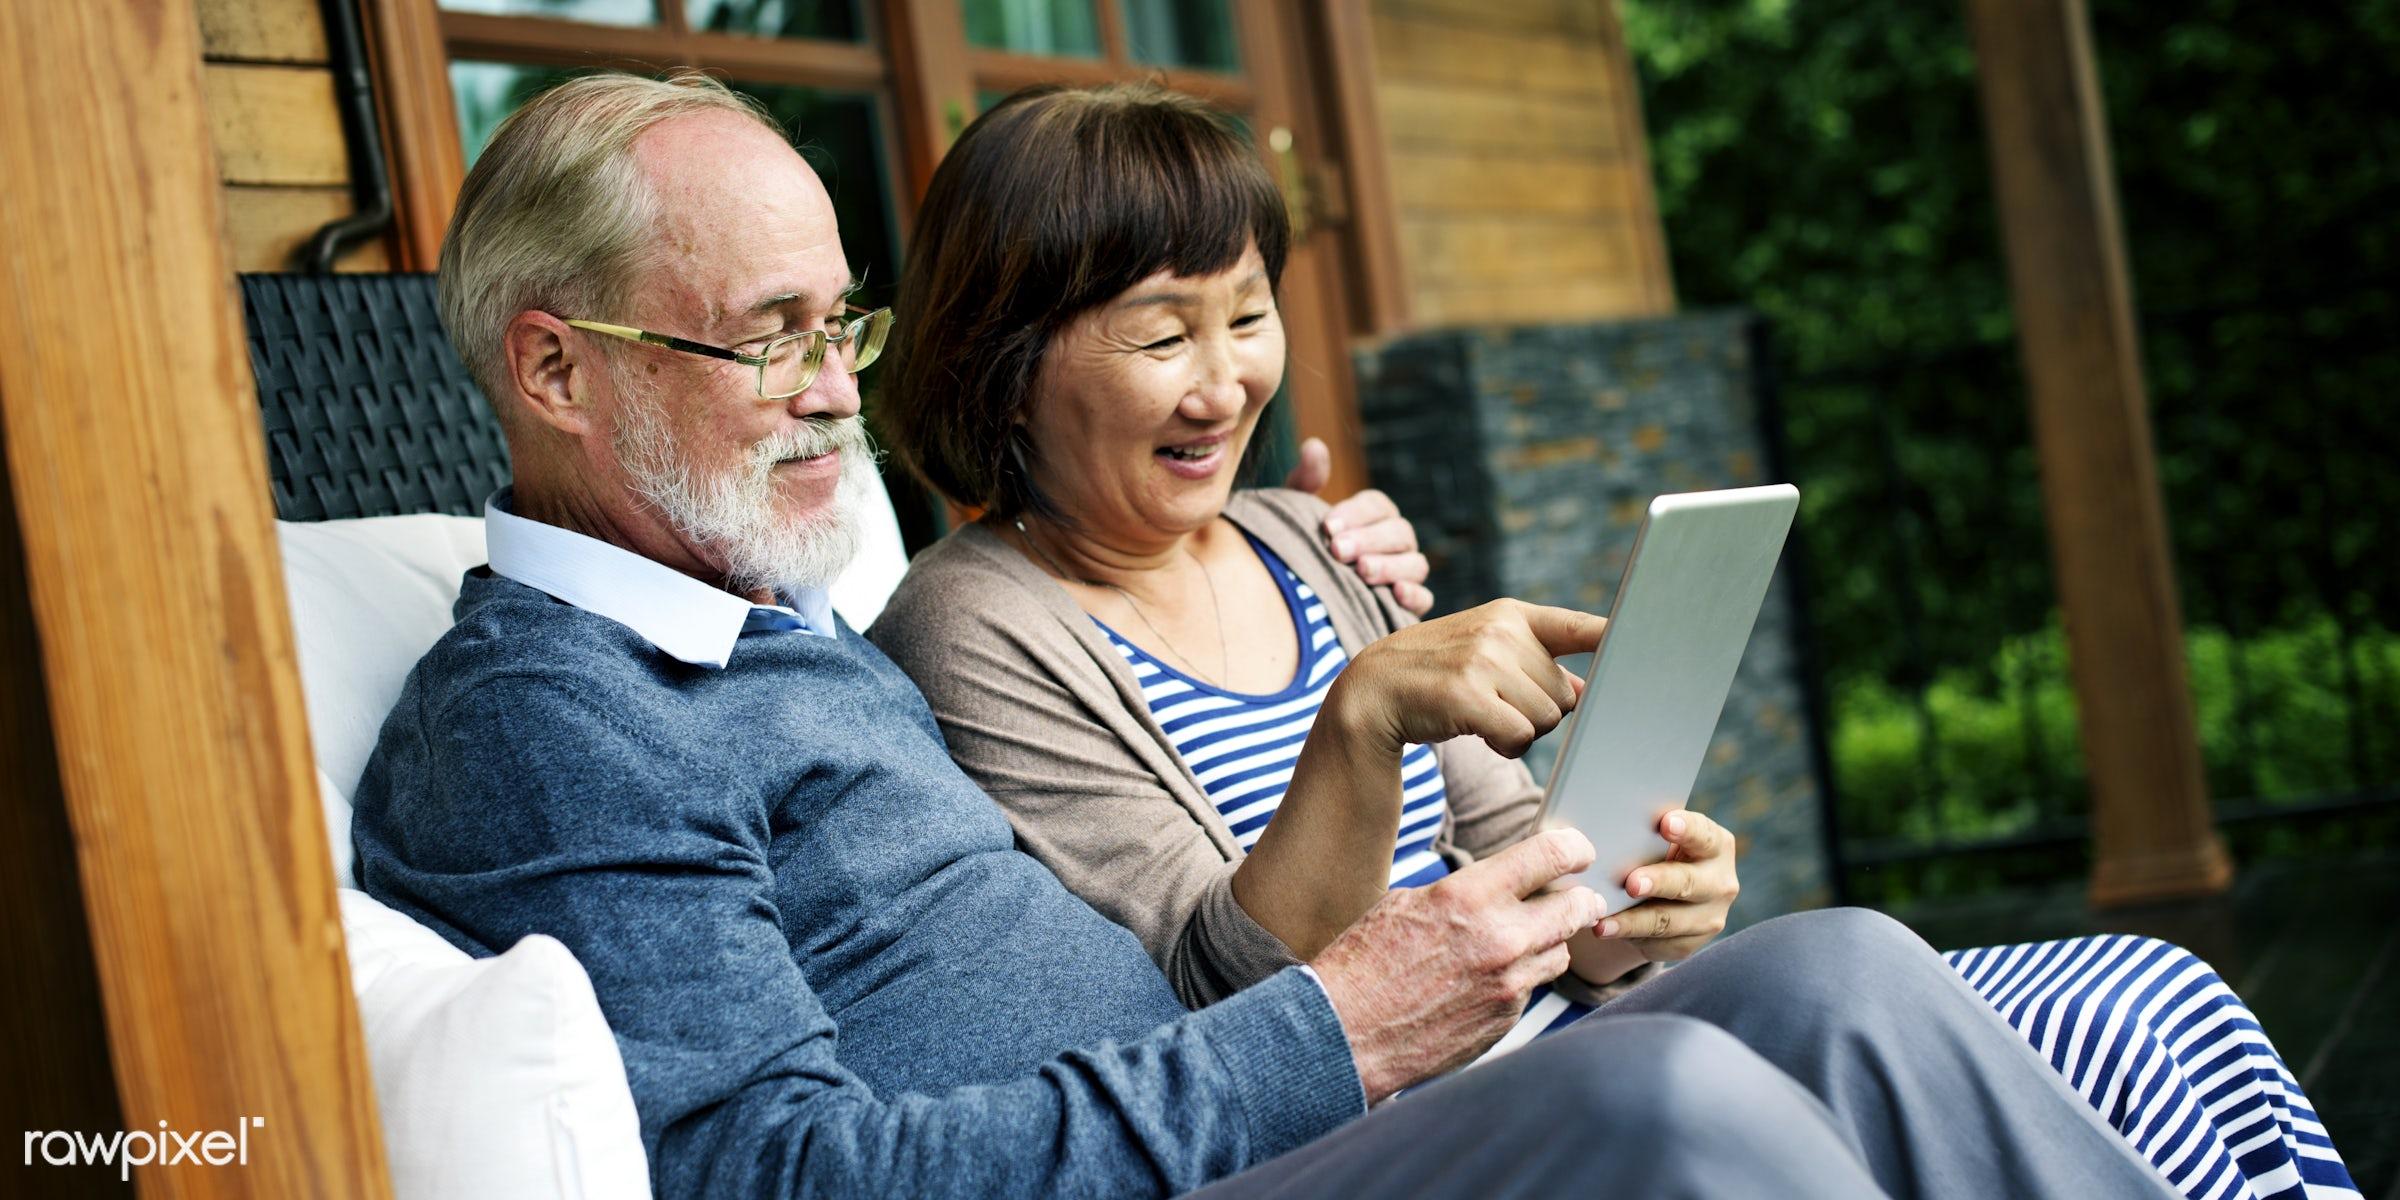 dating, adult, bonding, chair, cheerful, couple, device, digital, door, female, garden, grandfather, grandmother, happiness...